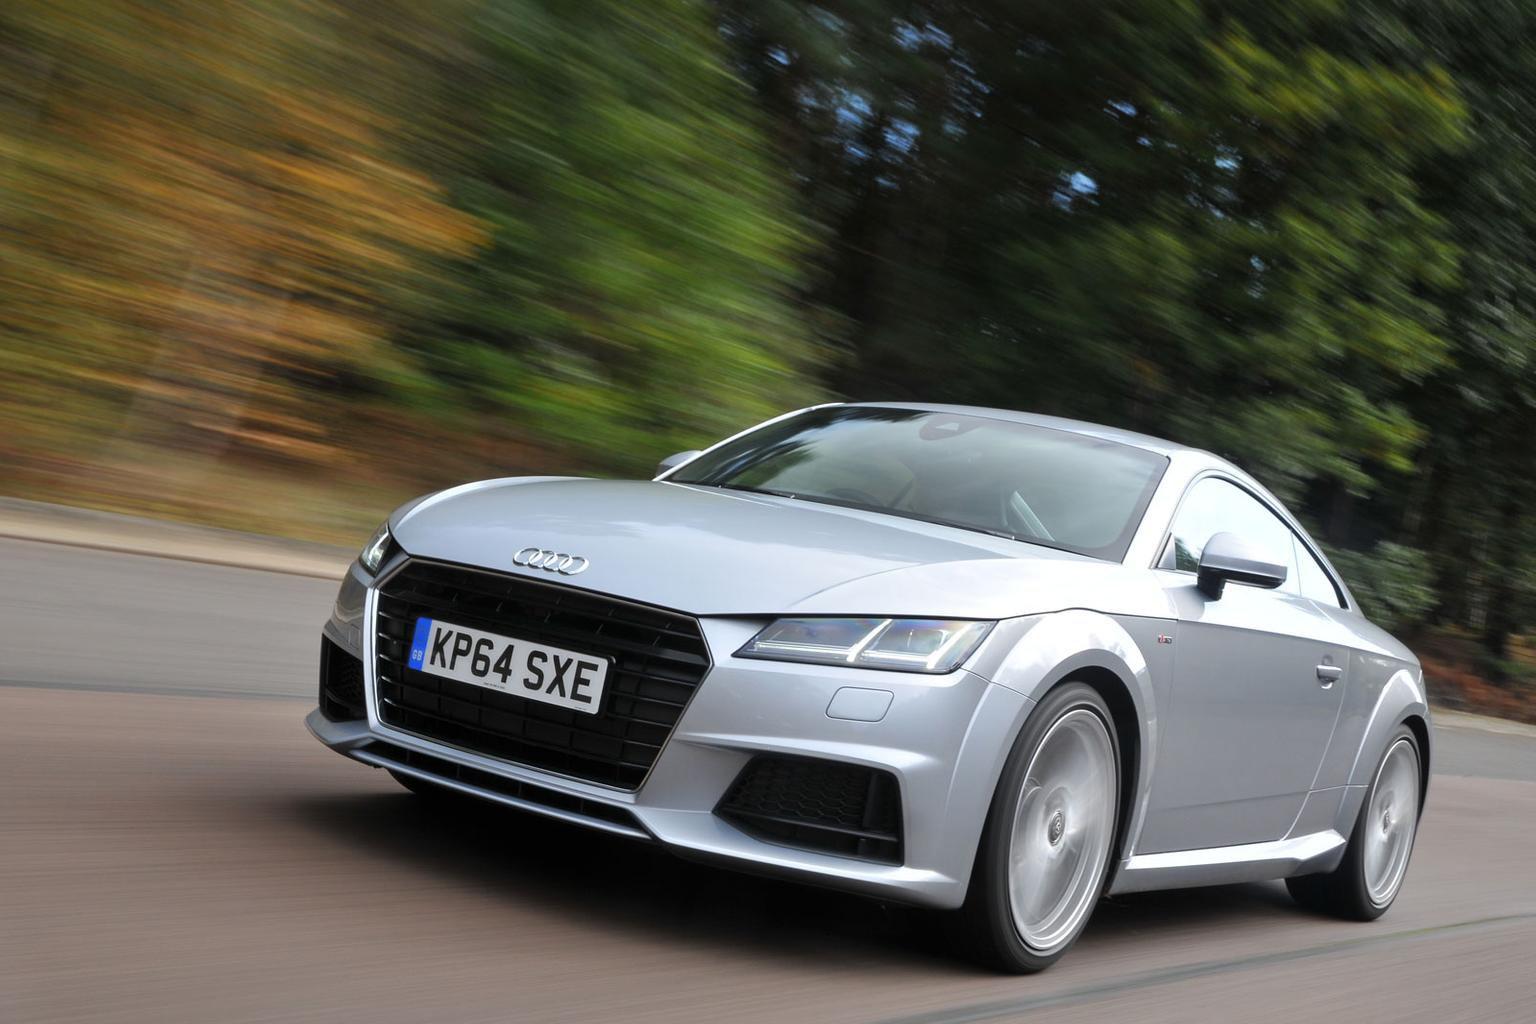 2015 Audi TT 2.0 TFSI review